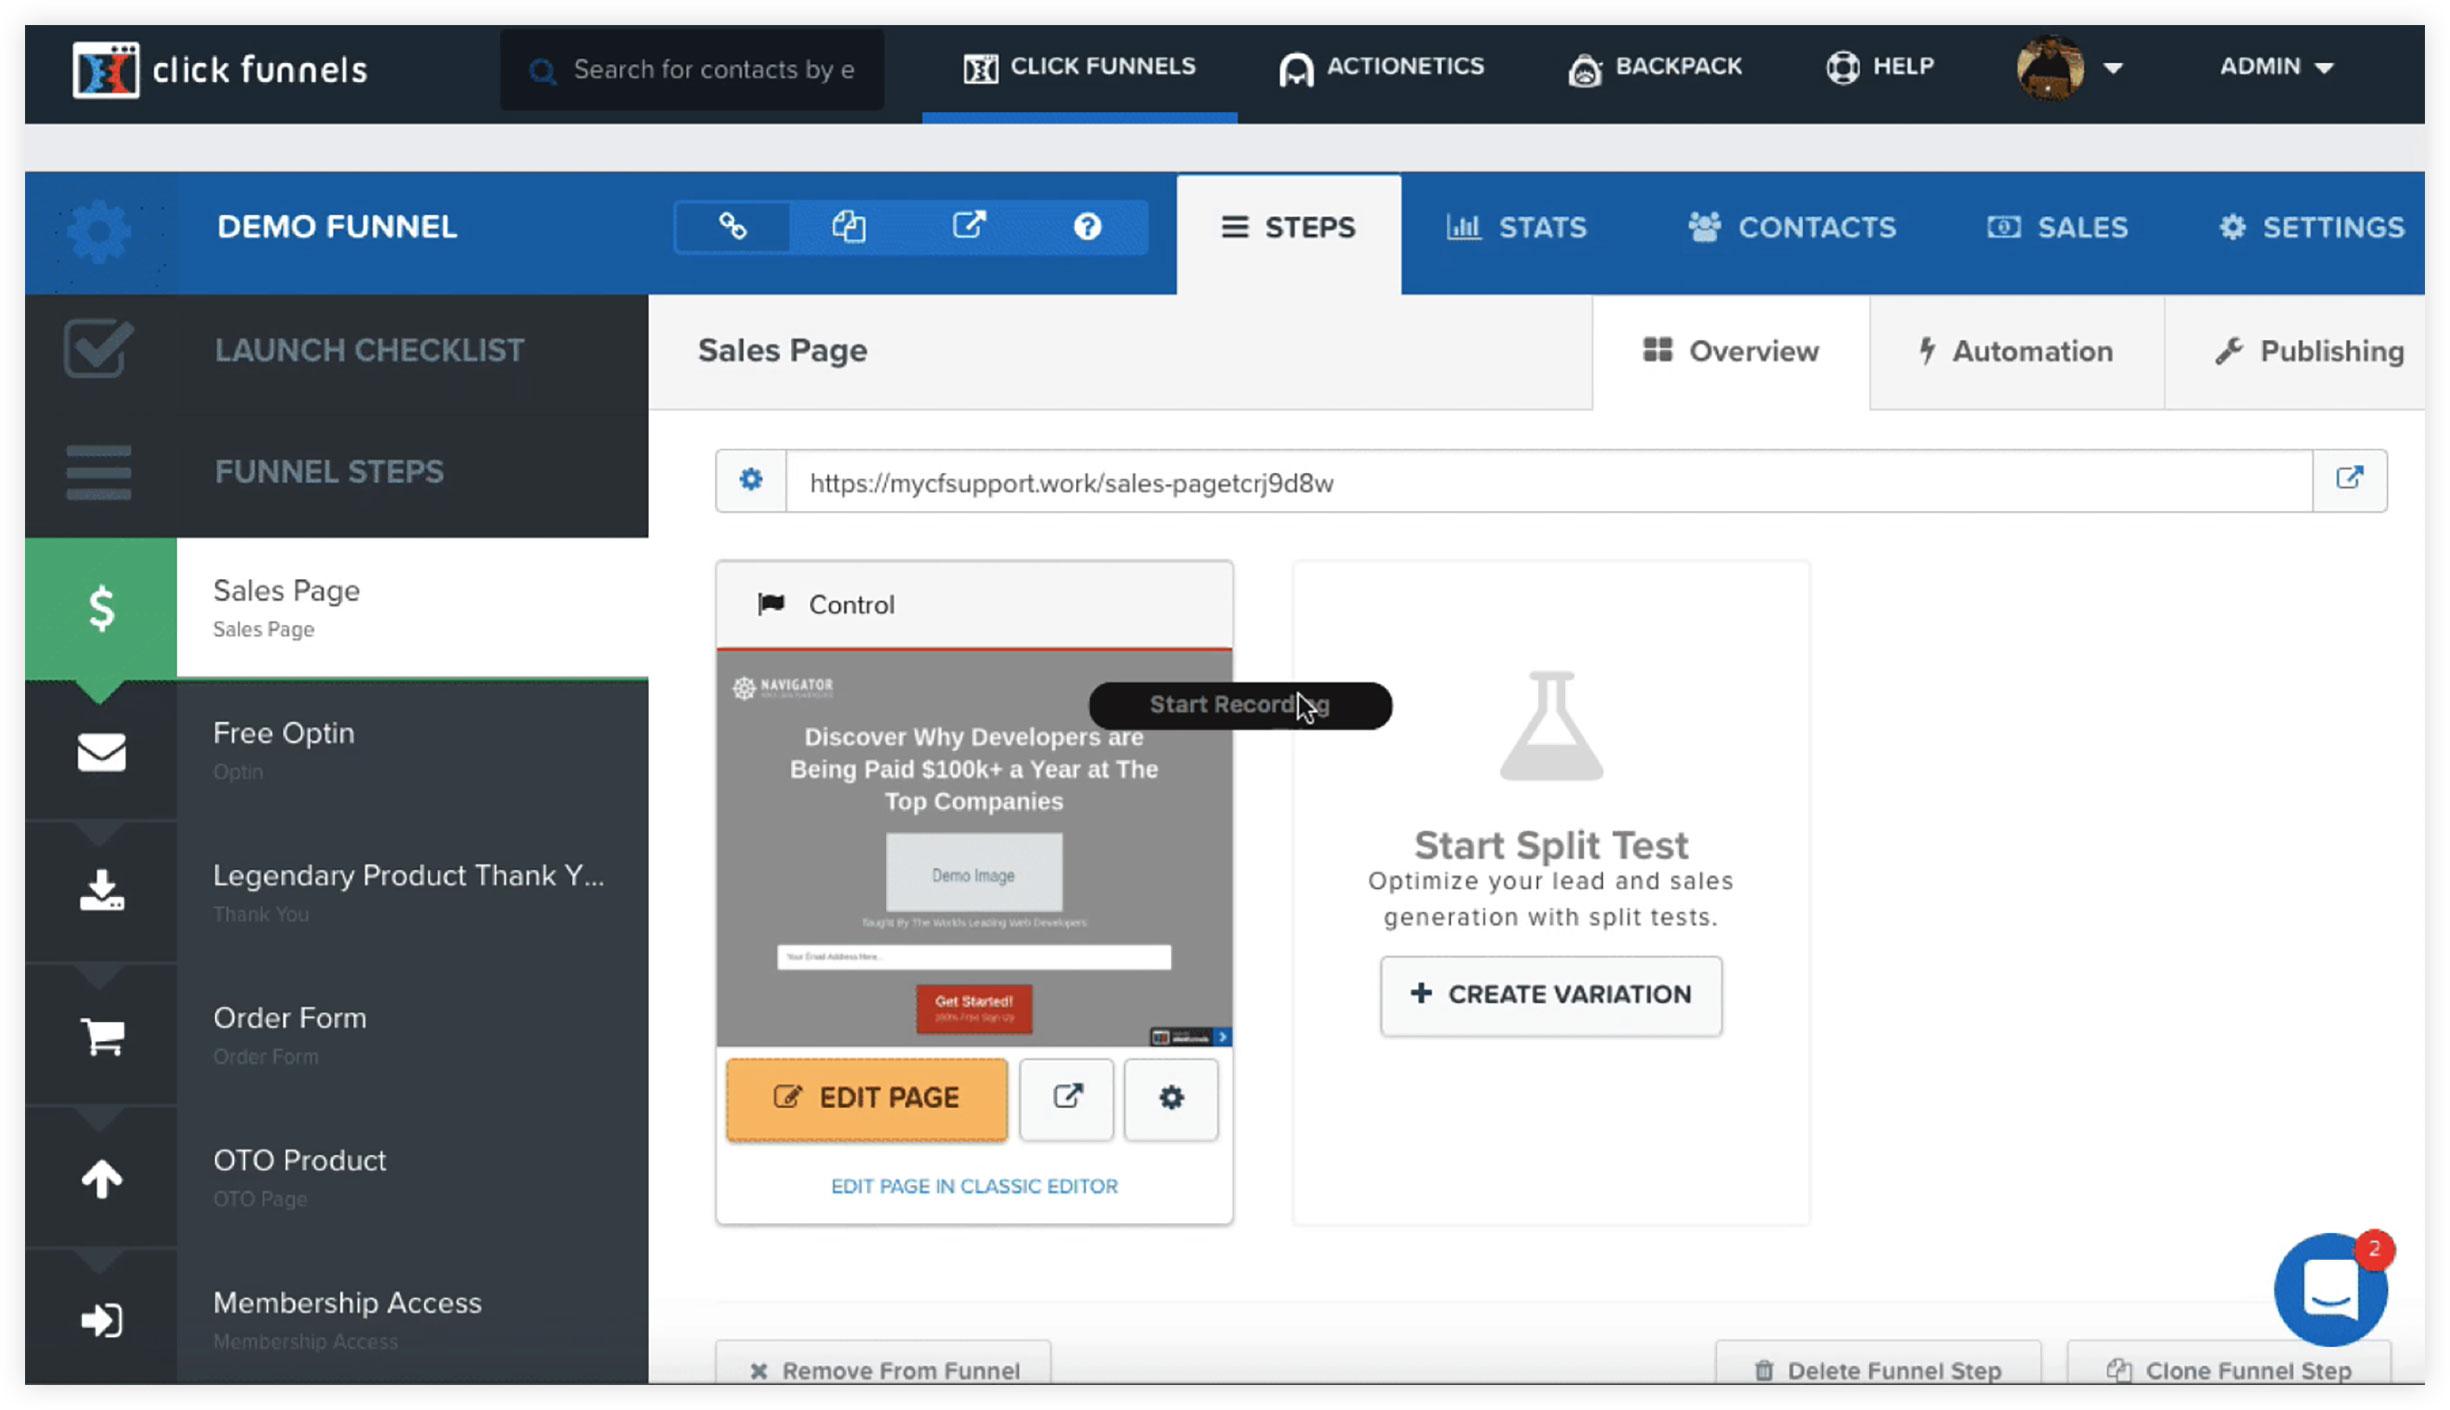 ClickFunnels Conversion Tracking